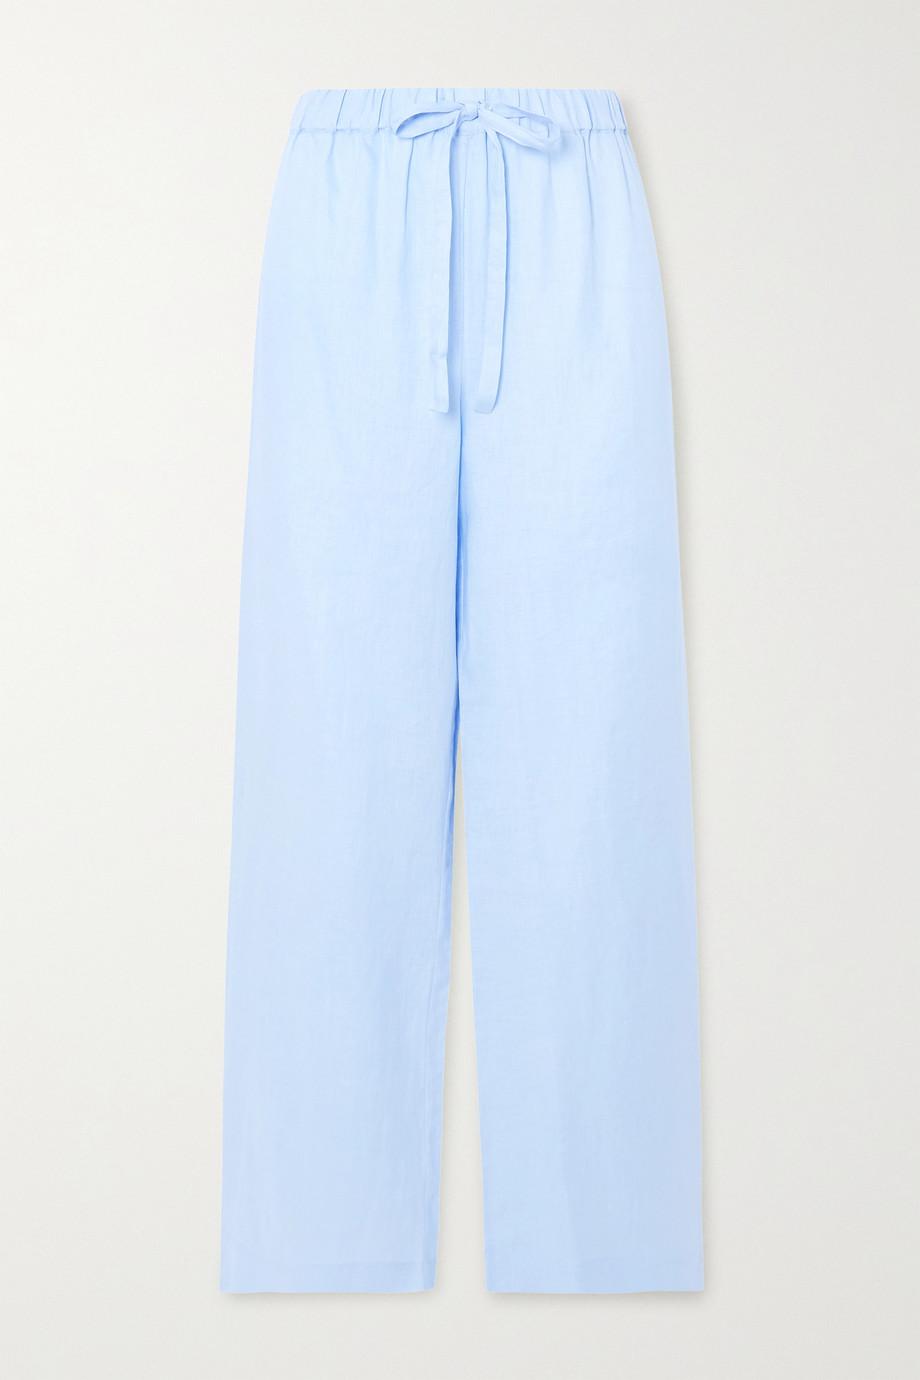 Maison Essentiele Everly Pyjama-Hose aus Leinen